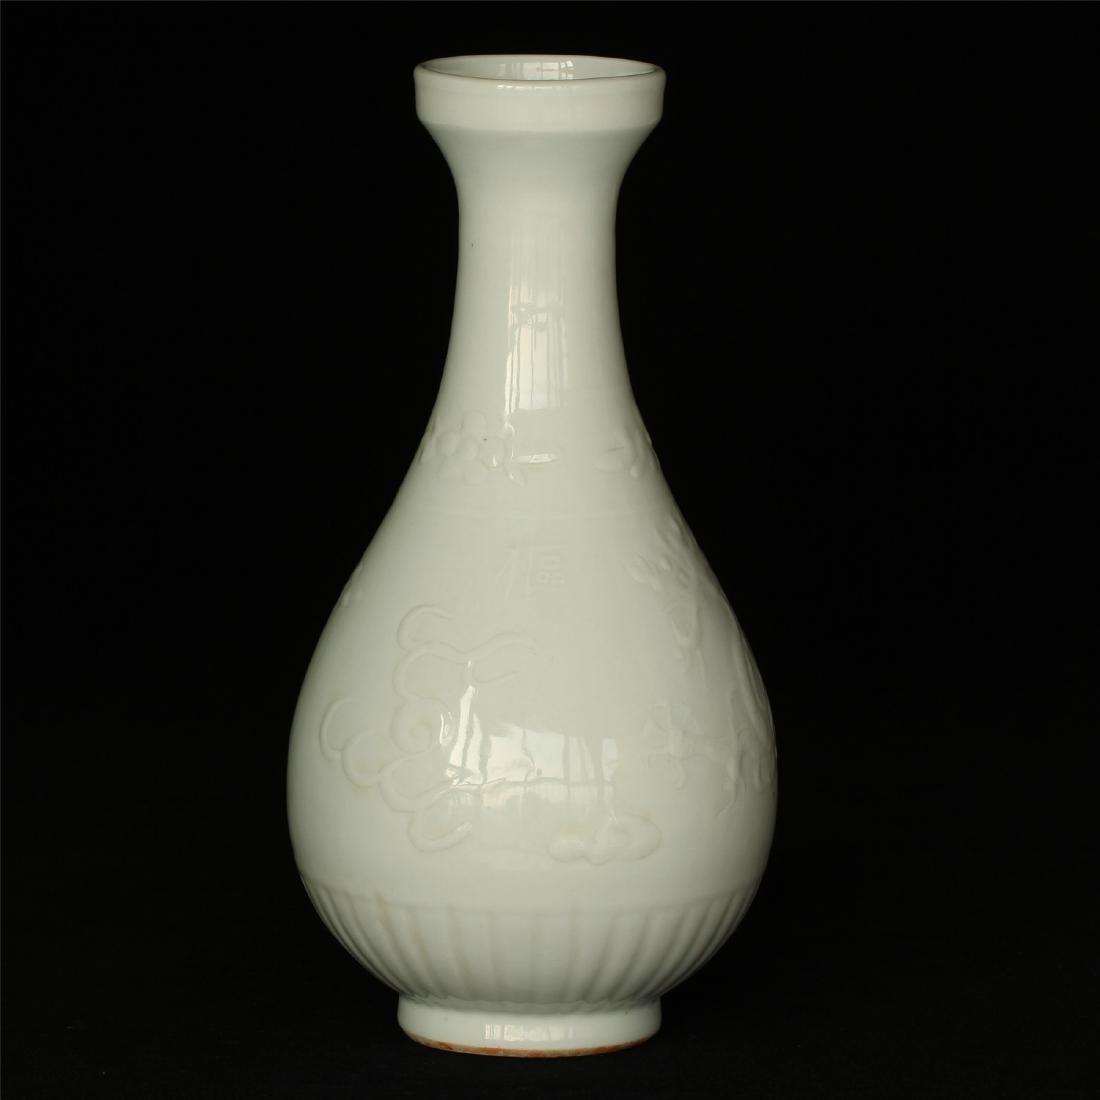 White porcelain carving vase of ShuFu mark.